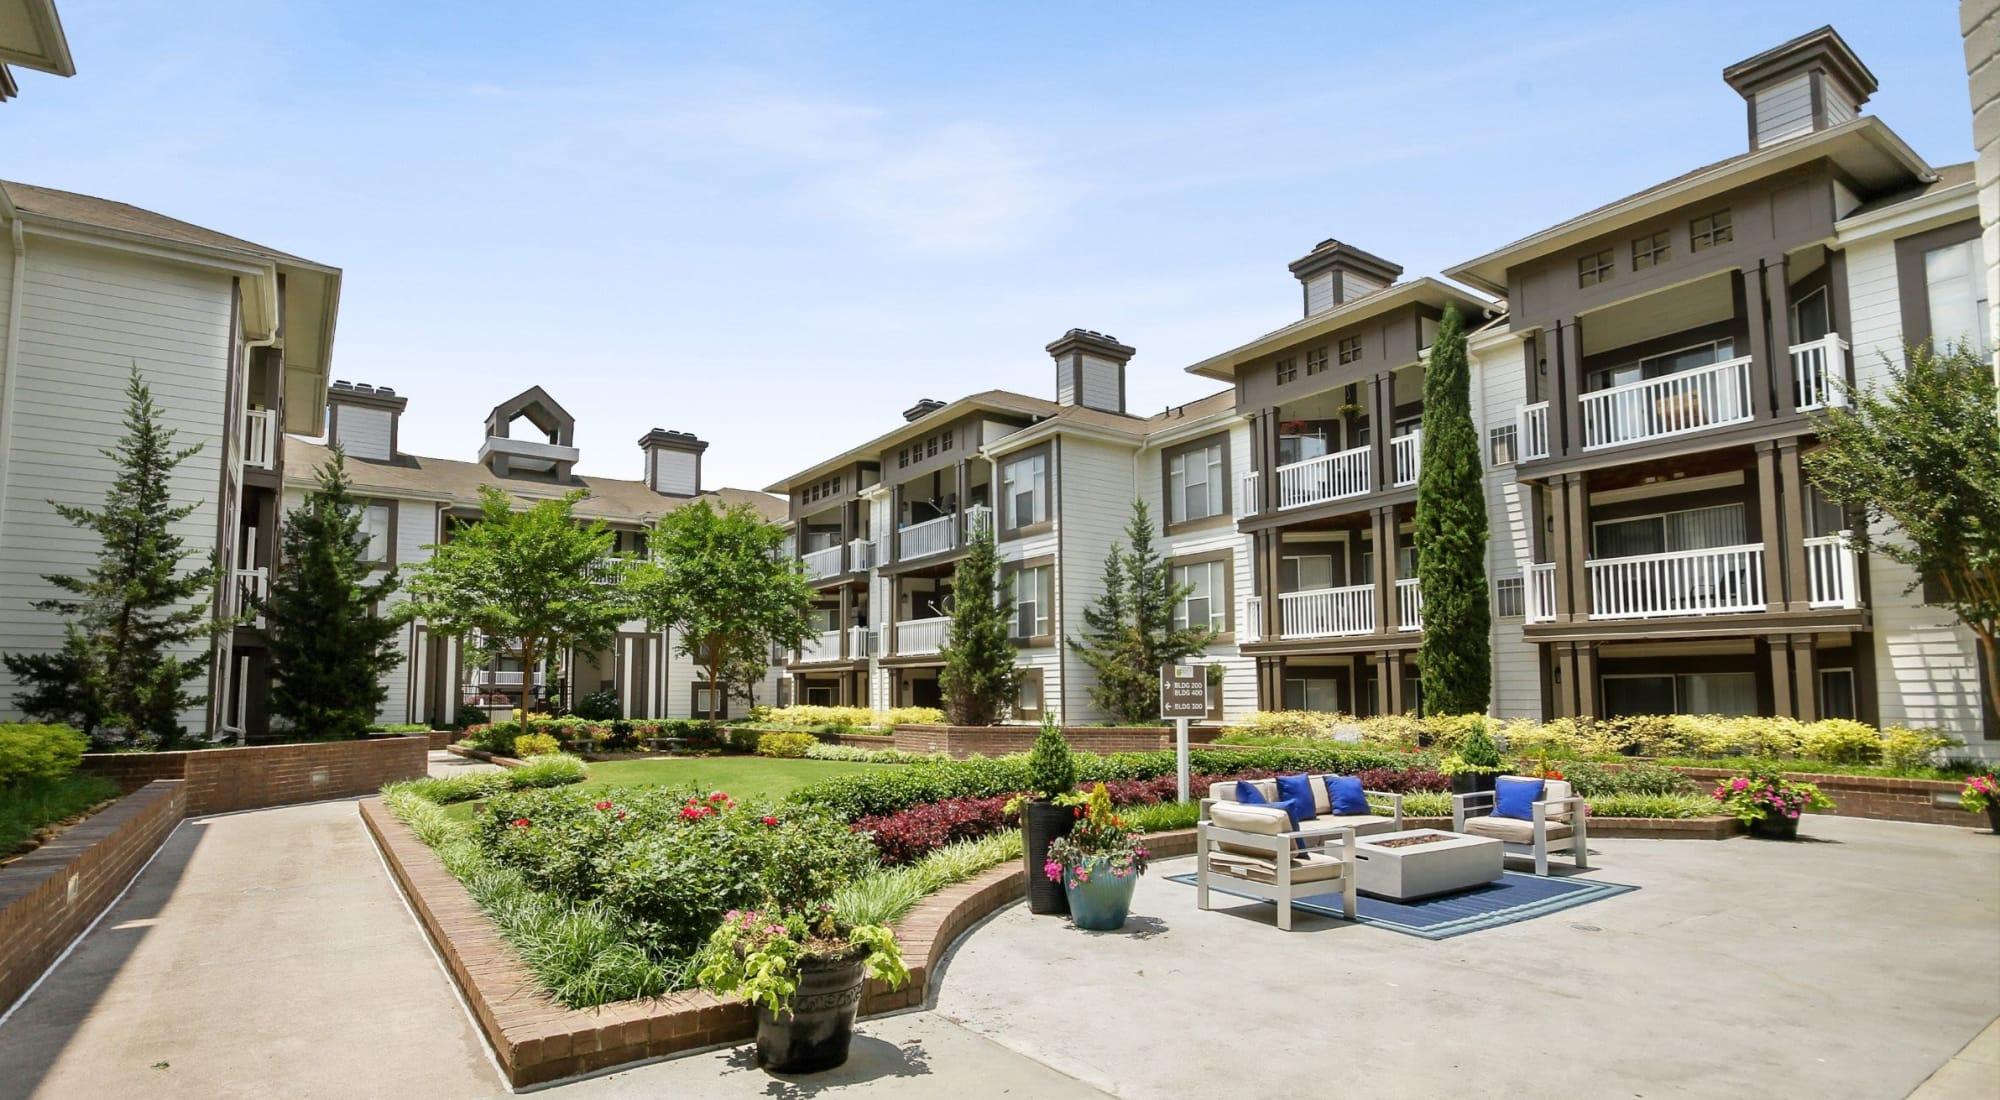 Apartments at 45Eighty Dunwoody Apartment Homes in Dunwoody, Georgia